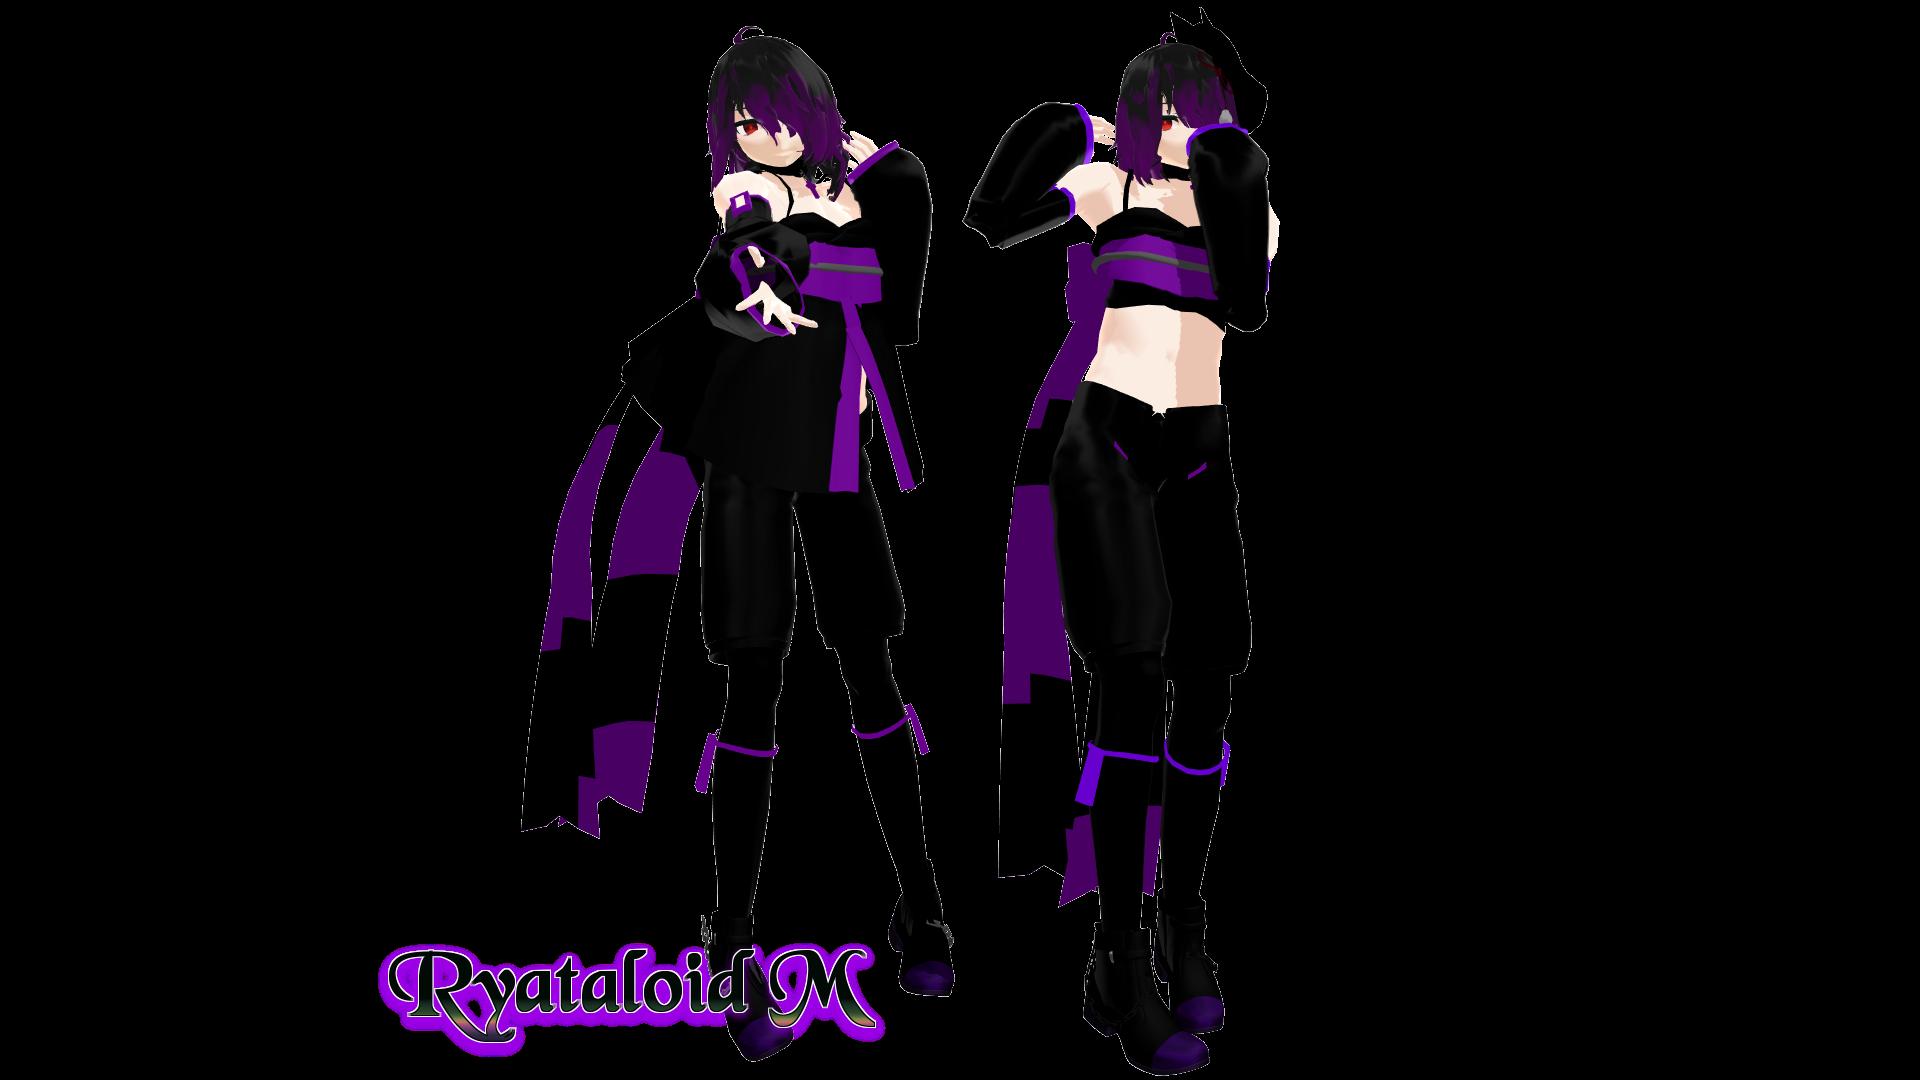 [MMD] UTAU - RYATALOID M by Ayatonic